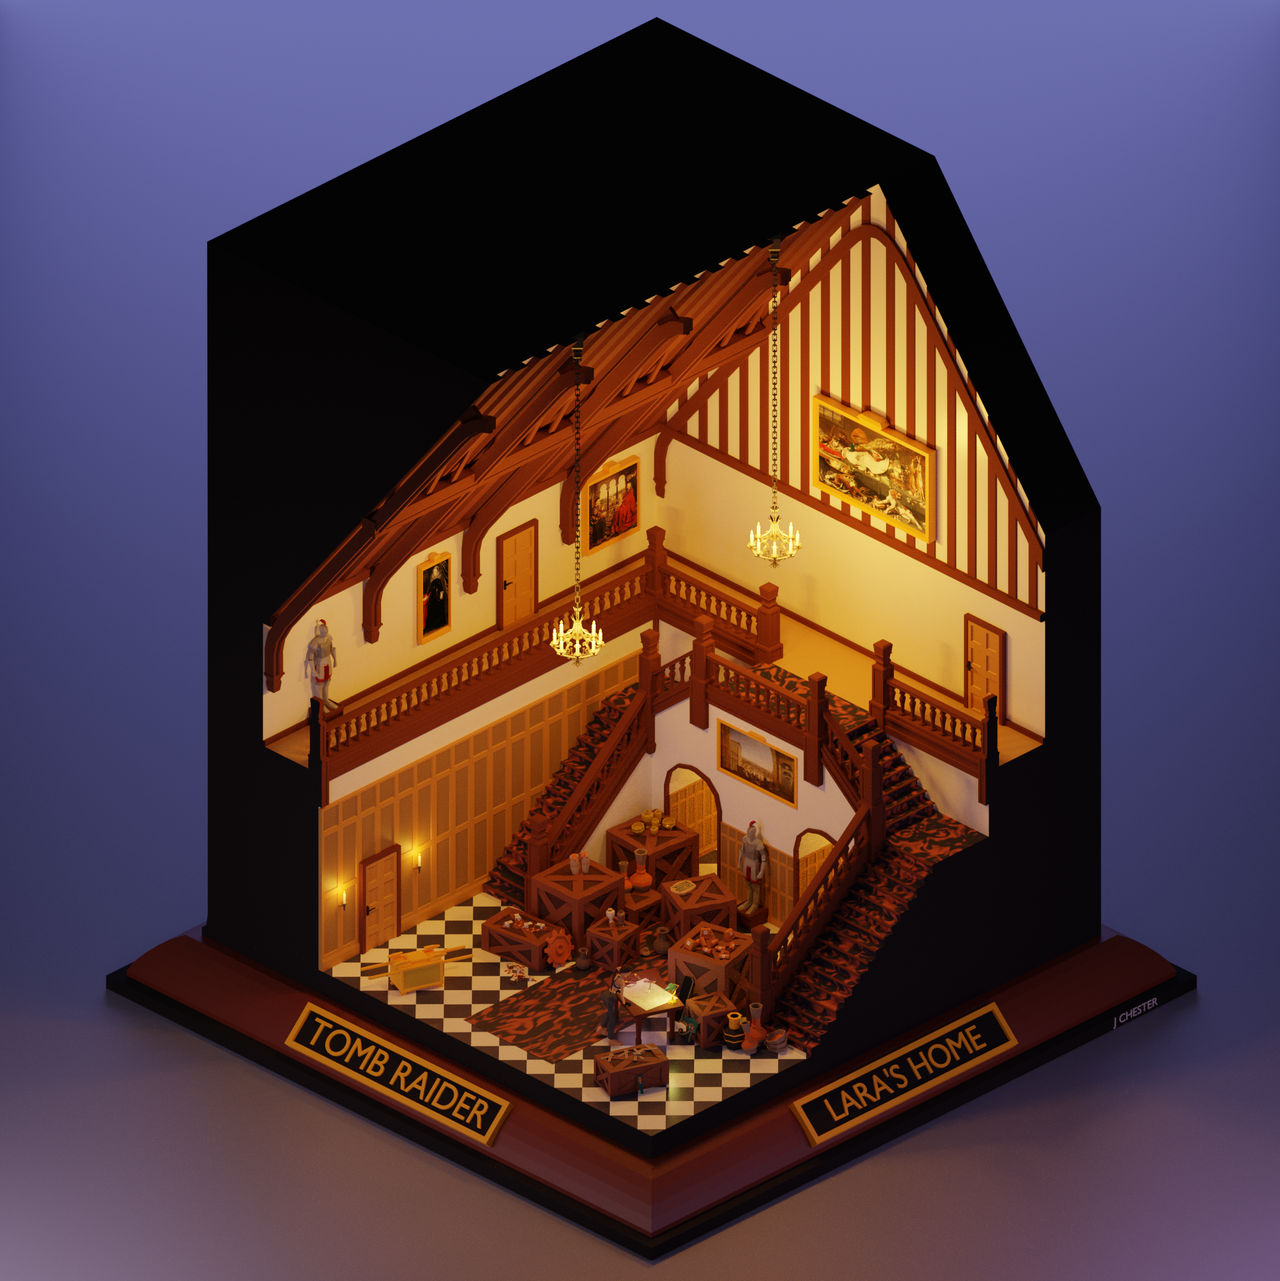 Lara's House Re-imagined (Tomb Raider 1996)